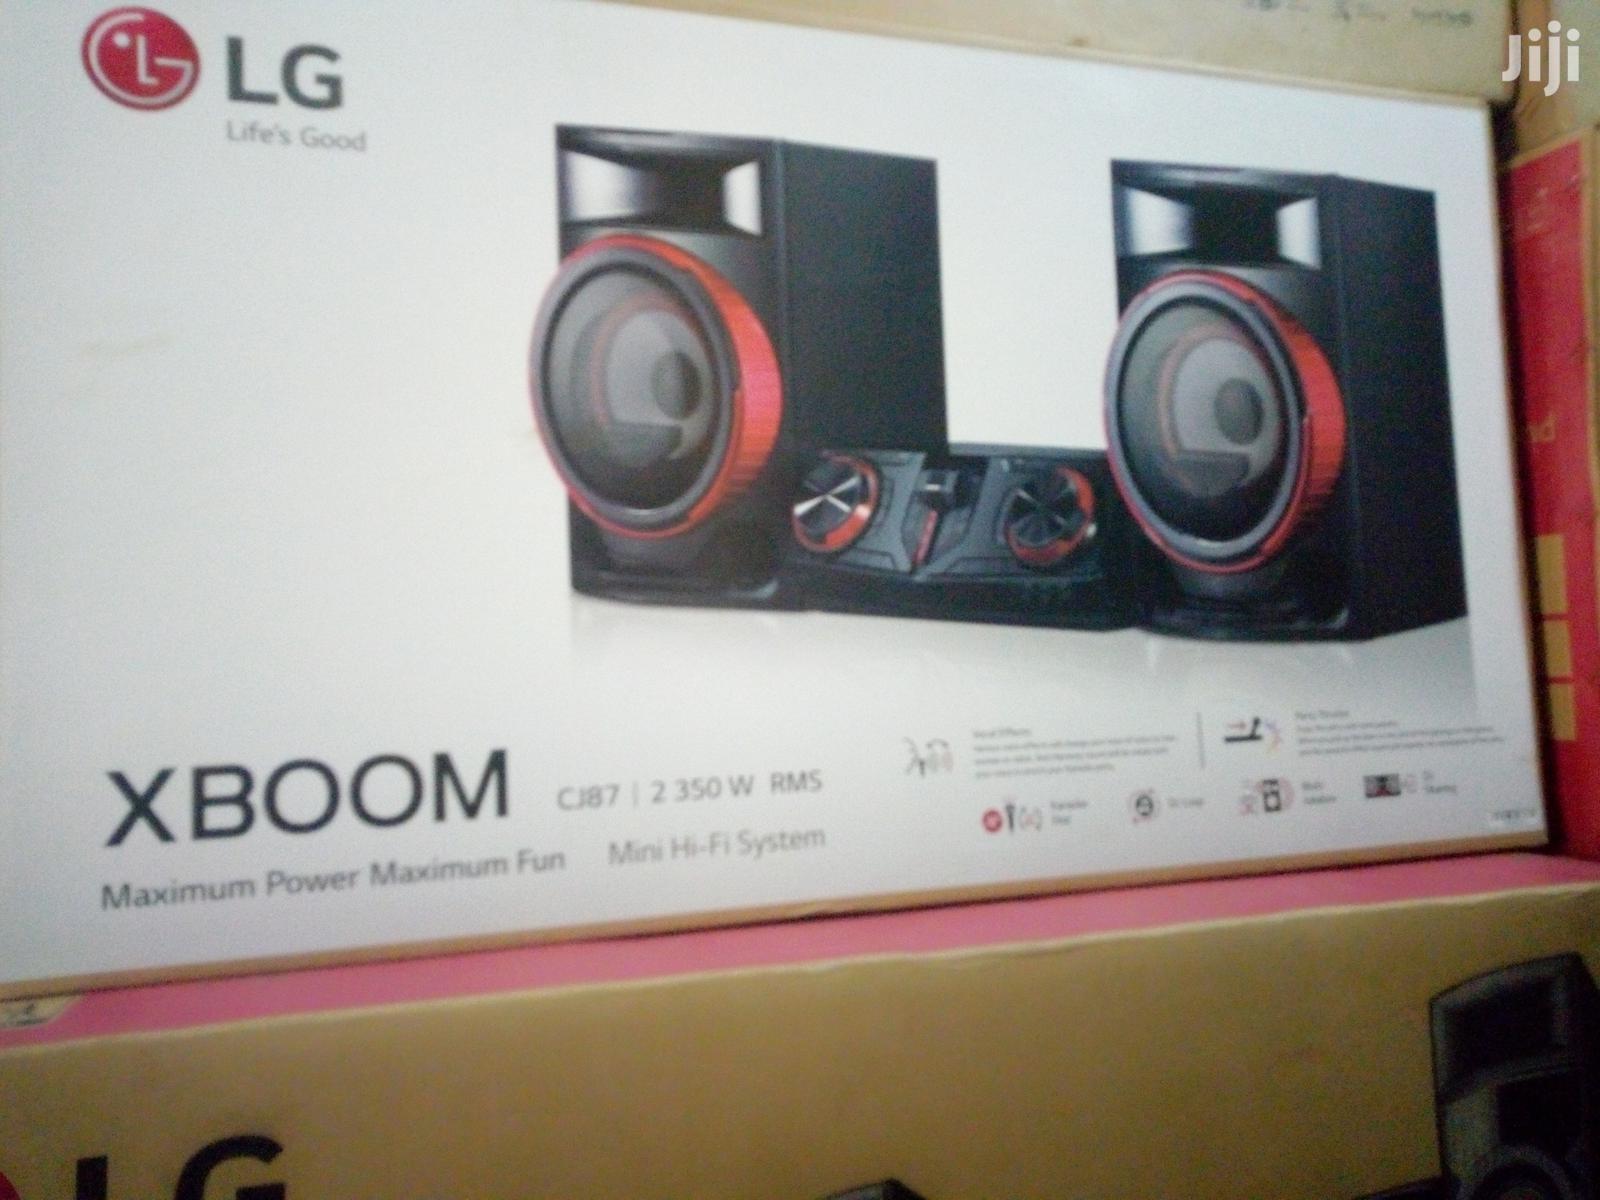 LG Cj87 Home Theater